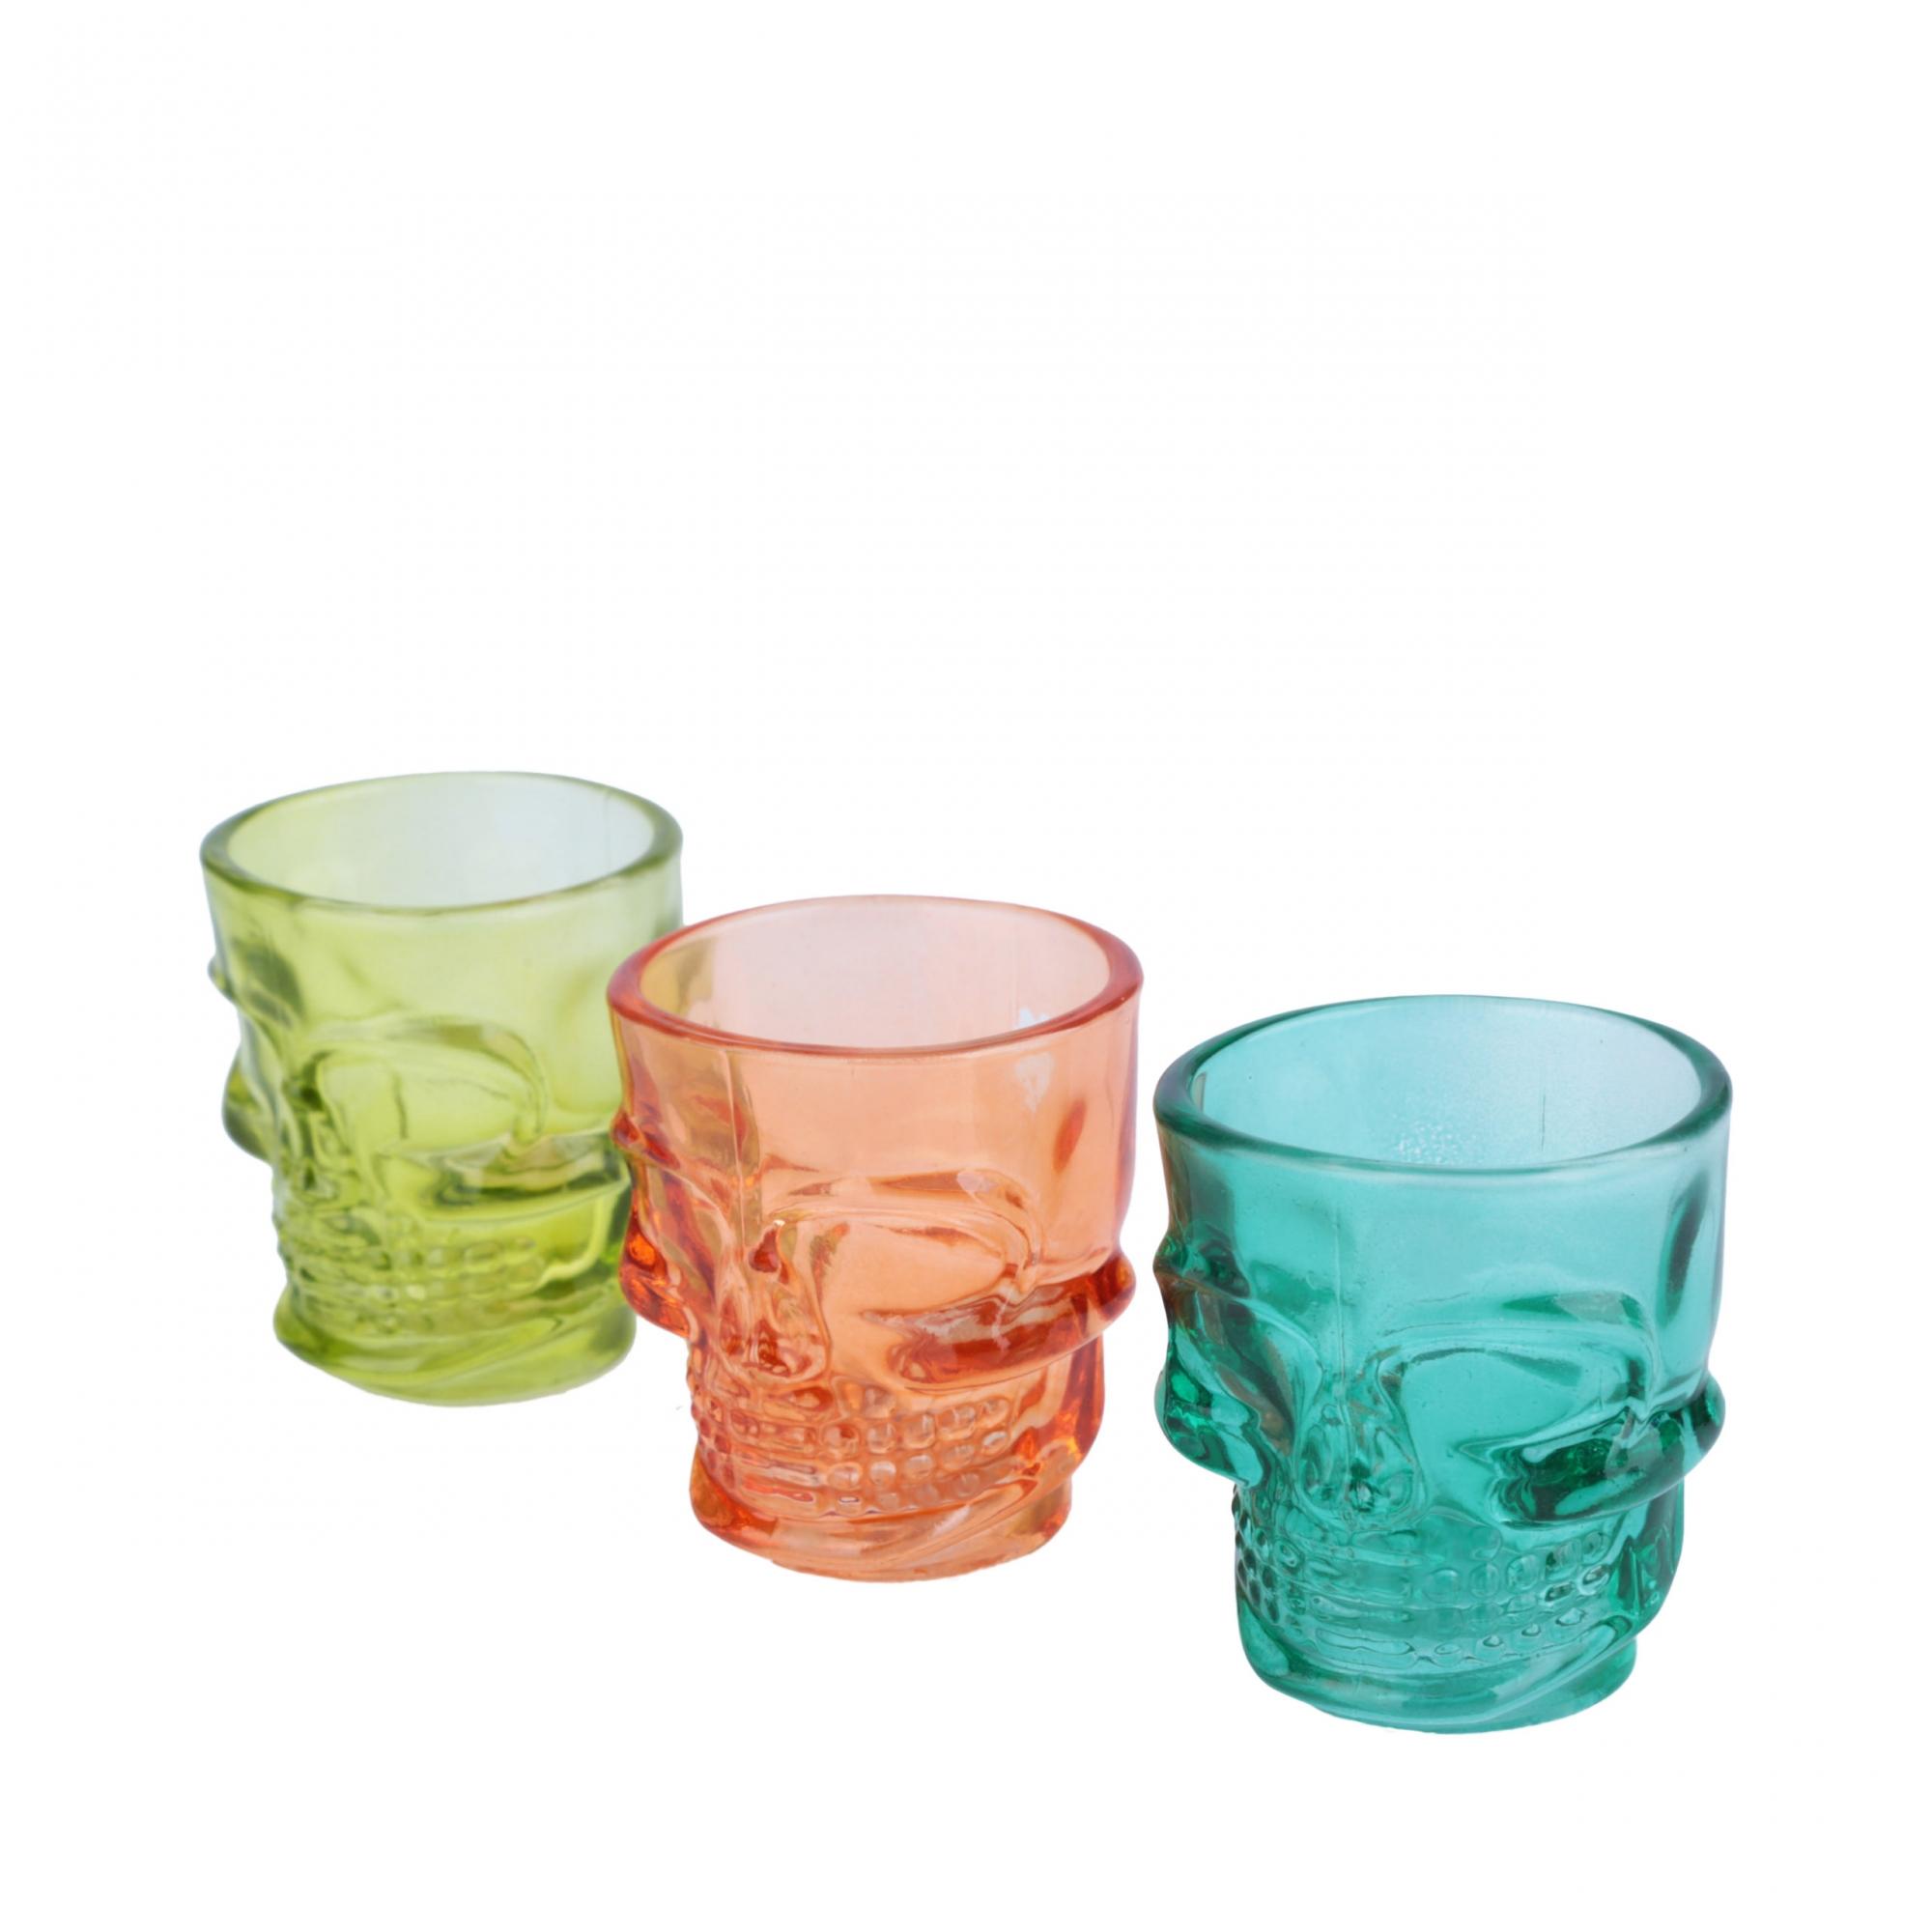 Set 3 copos dose vidro Skull colorido 50ml 8x5,8cm Urban